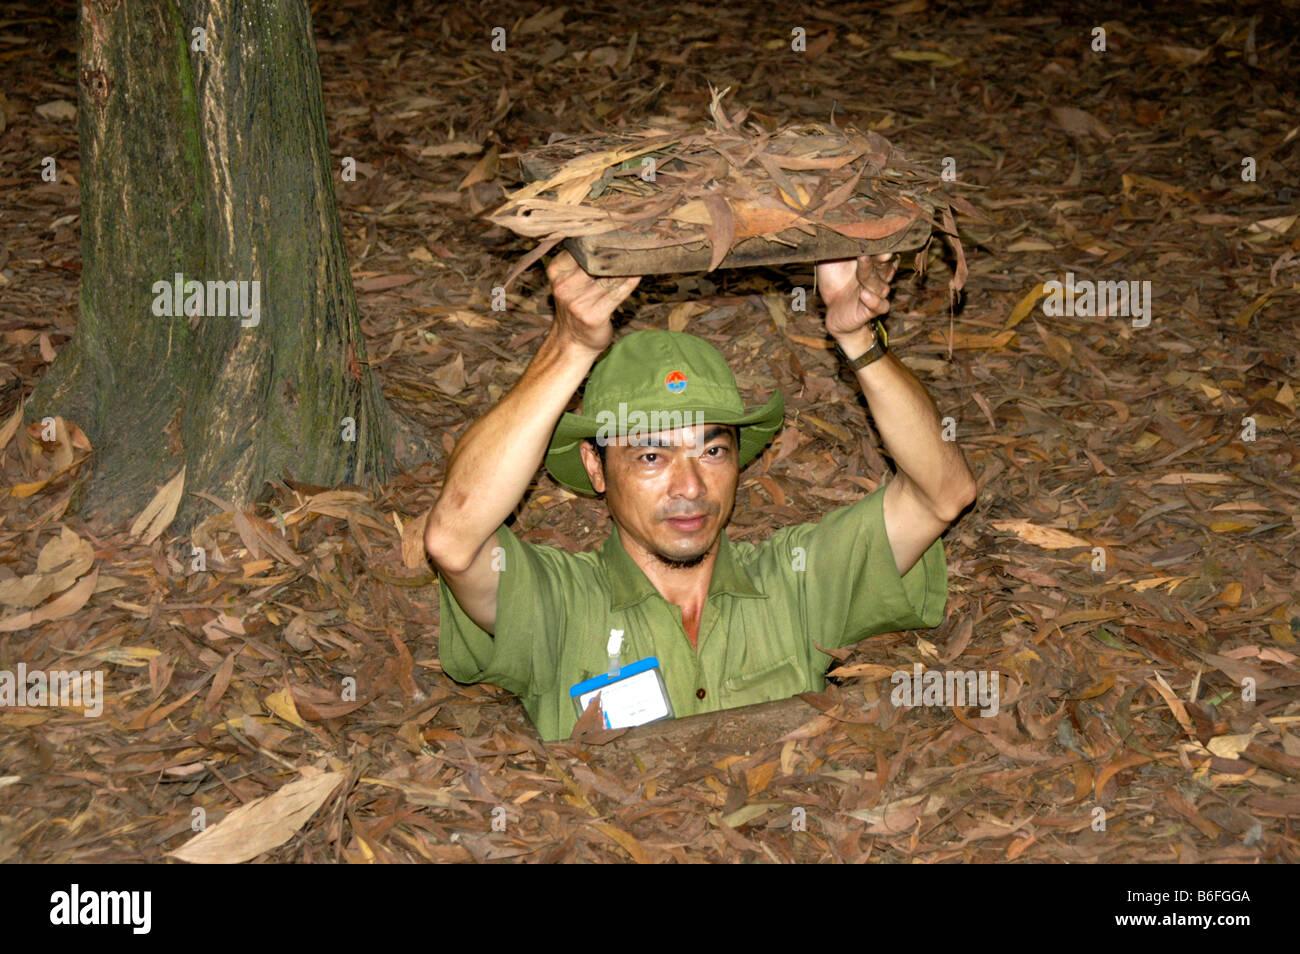 Uomo in una grotta in terra, Cu Chi, Vietnam, sud-est asiatico Immagini Stock